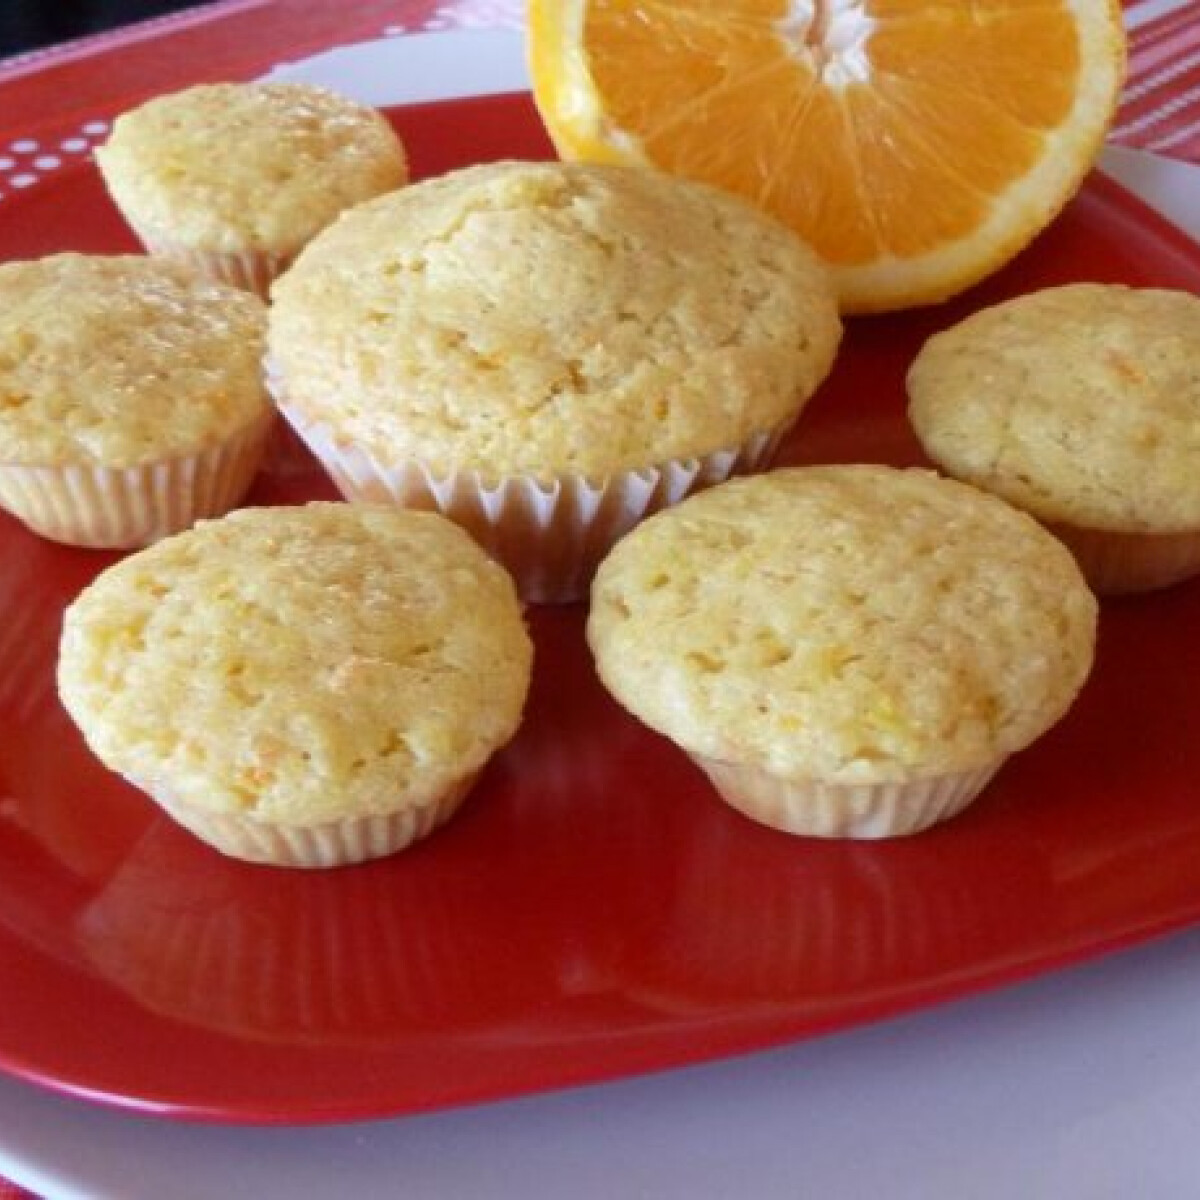 Ezen a képen: Narancs muffin